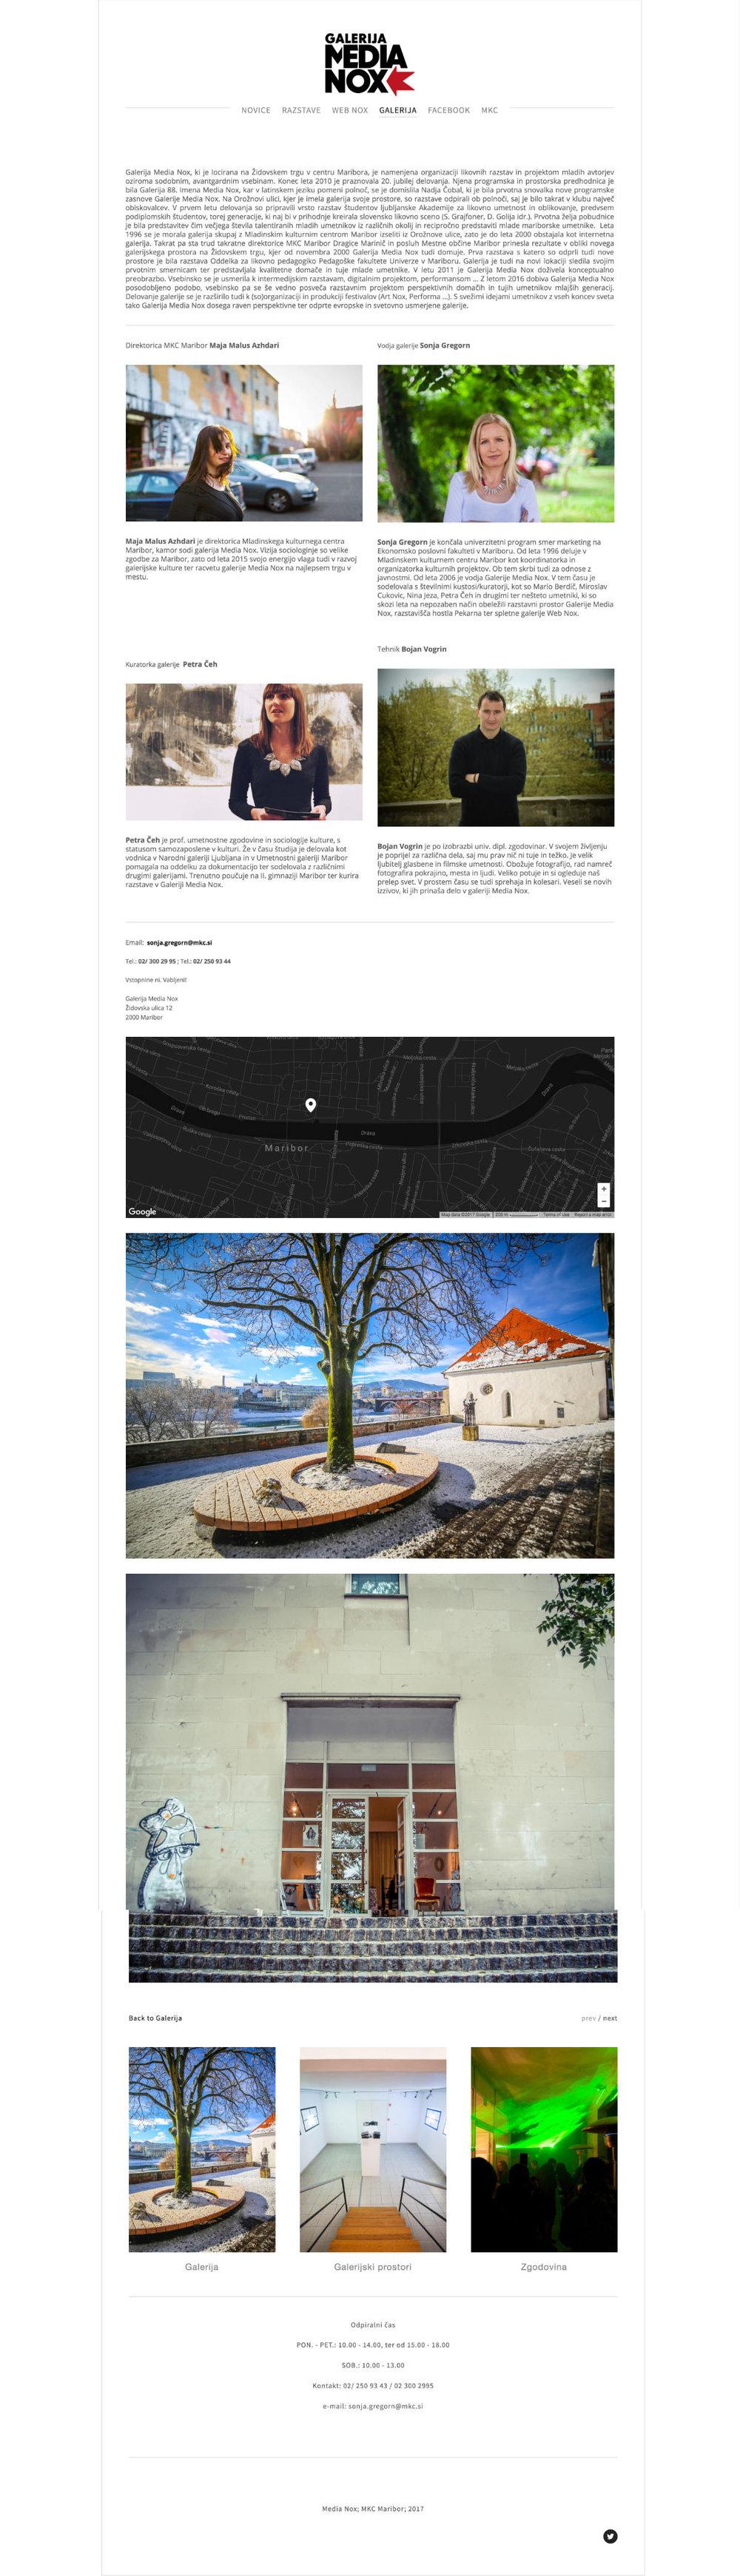 medianox_galerija.jpg